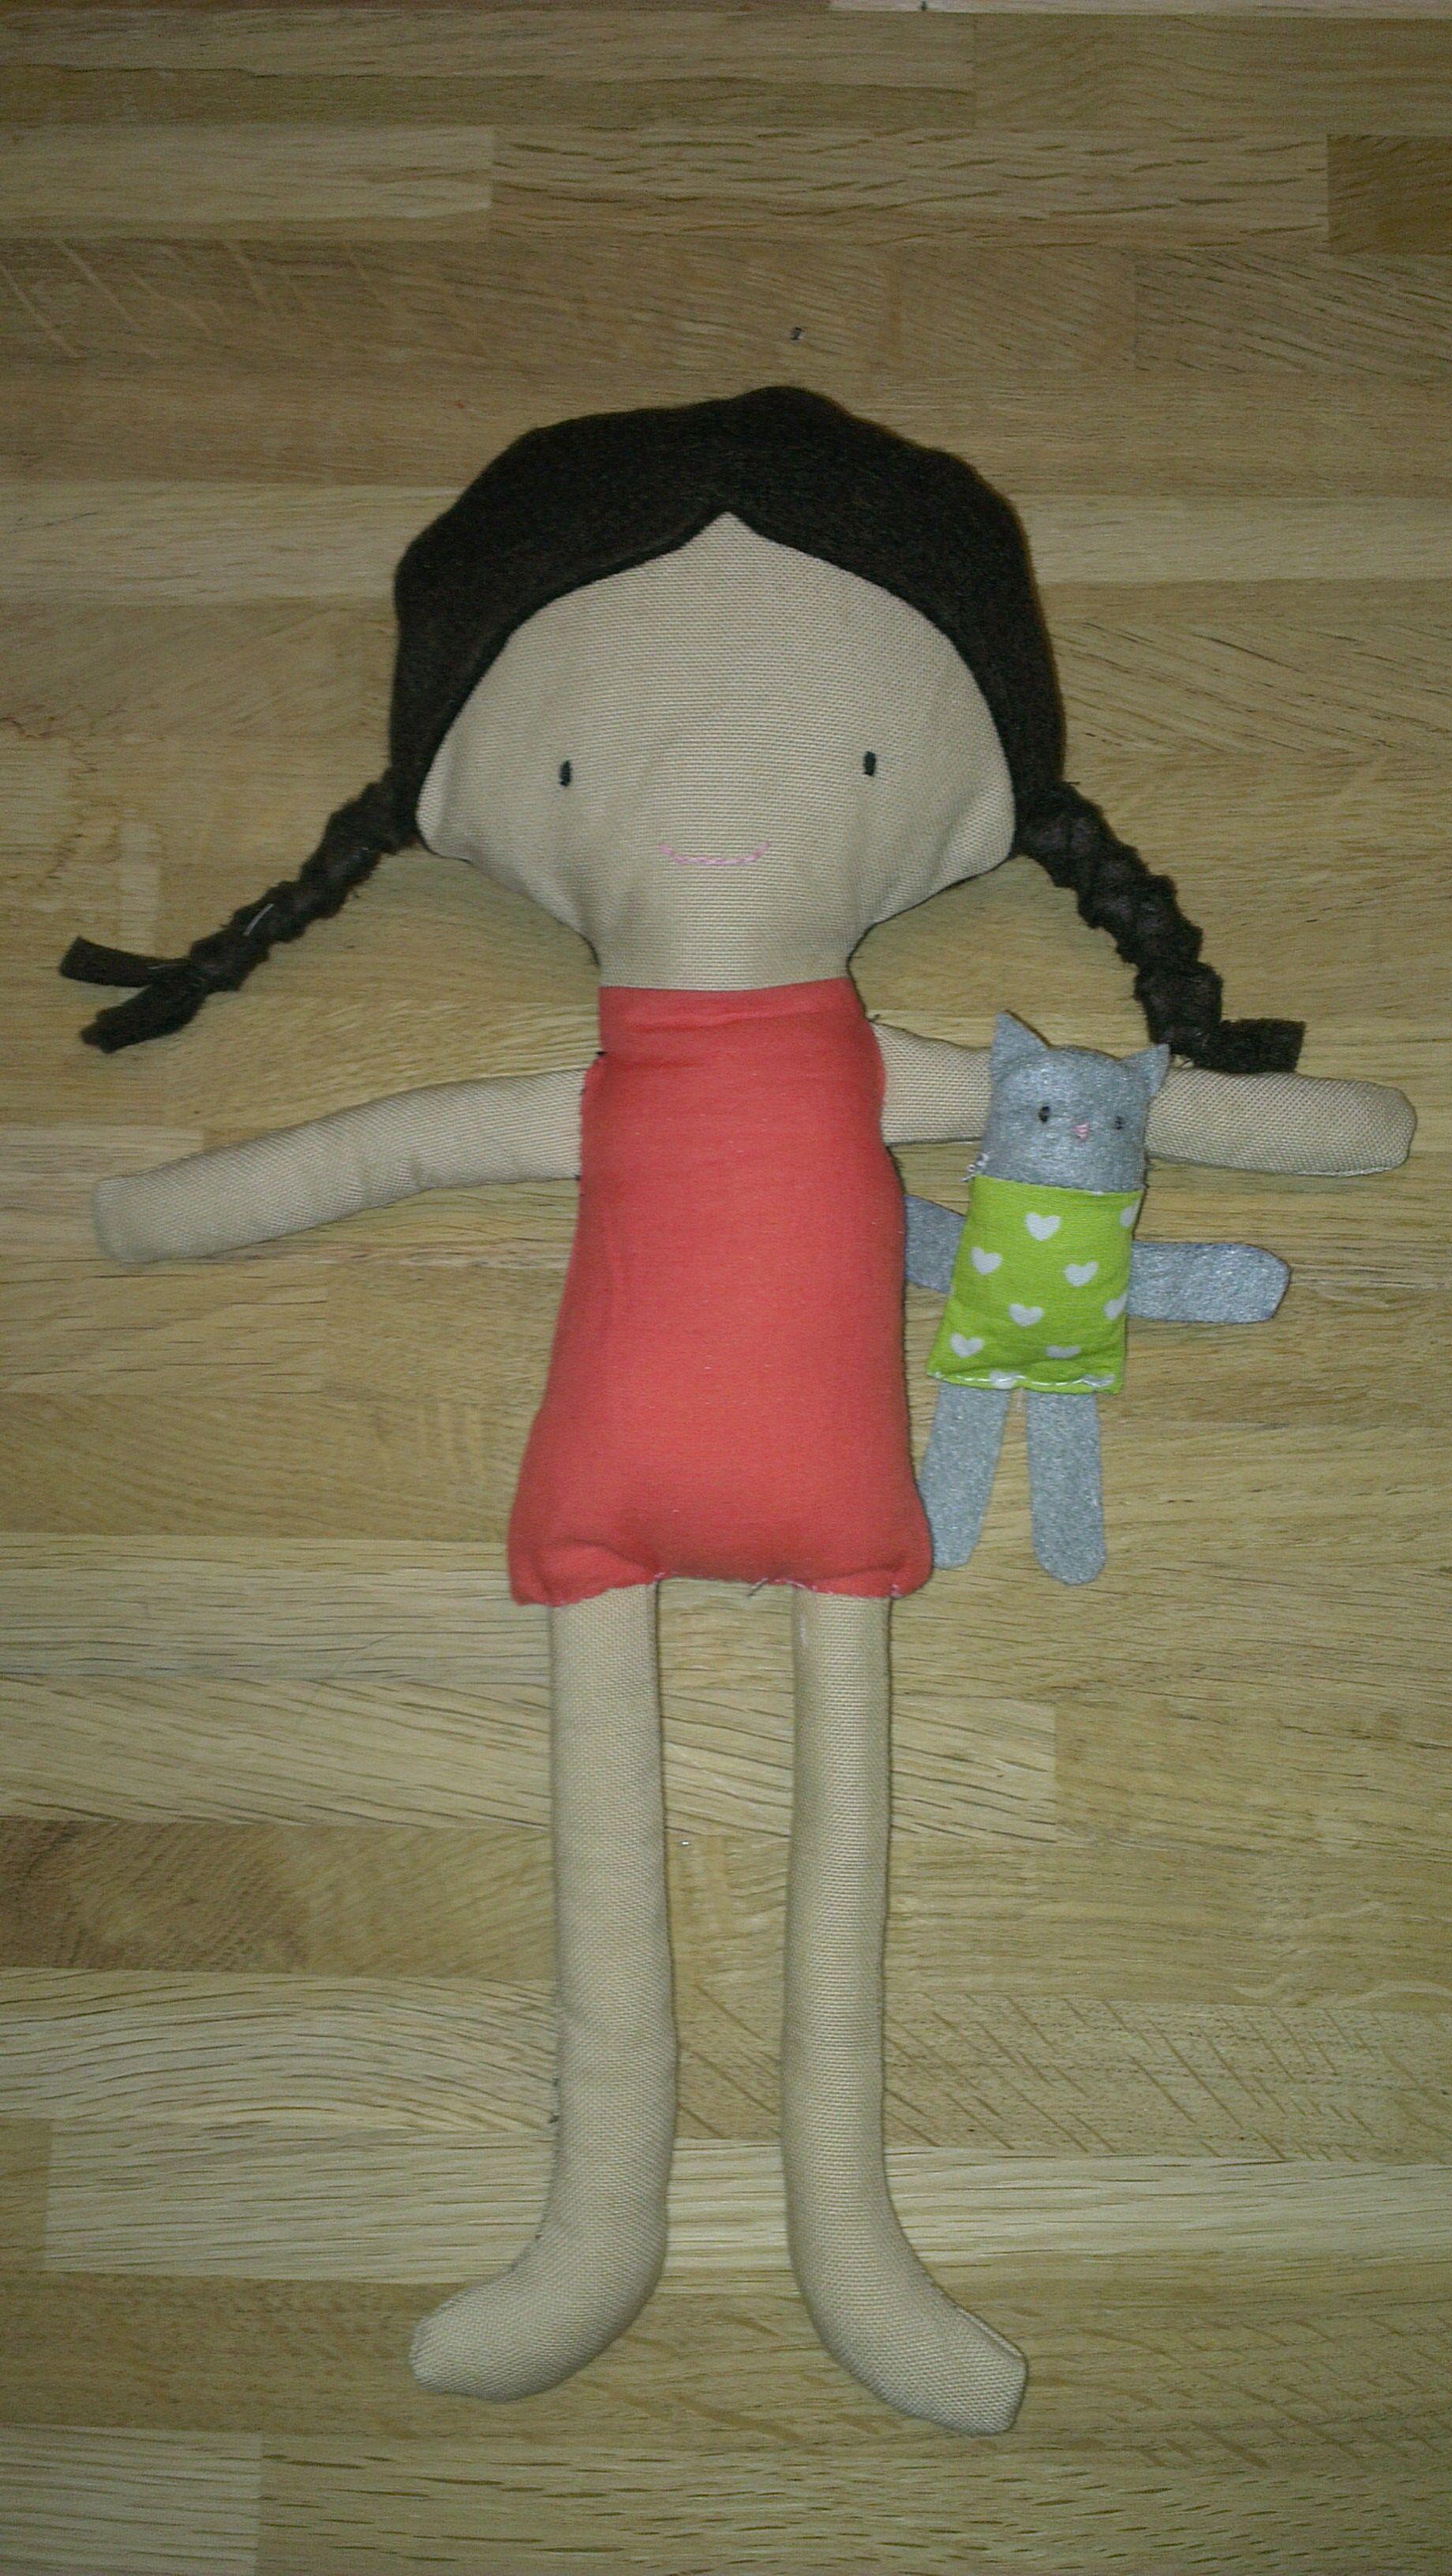 Geïnspireerd door http://www.elfpop.com/ - Elf Pop Amber doll sewing pattern